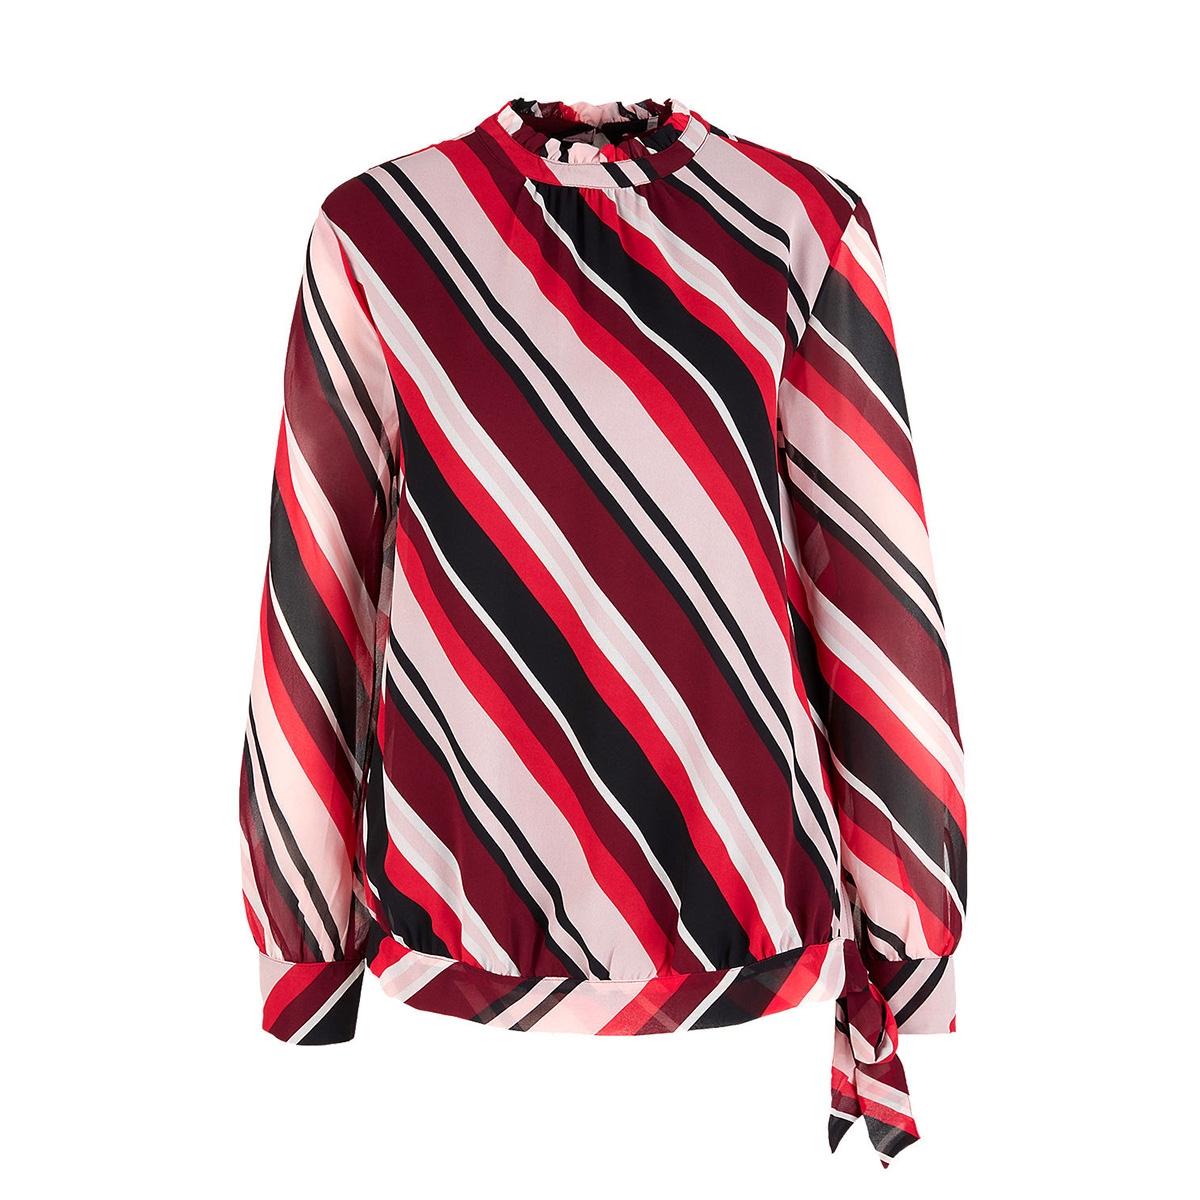 blouse met streeppatroon 14911112734 s.oliver blouse 42g1